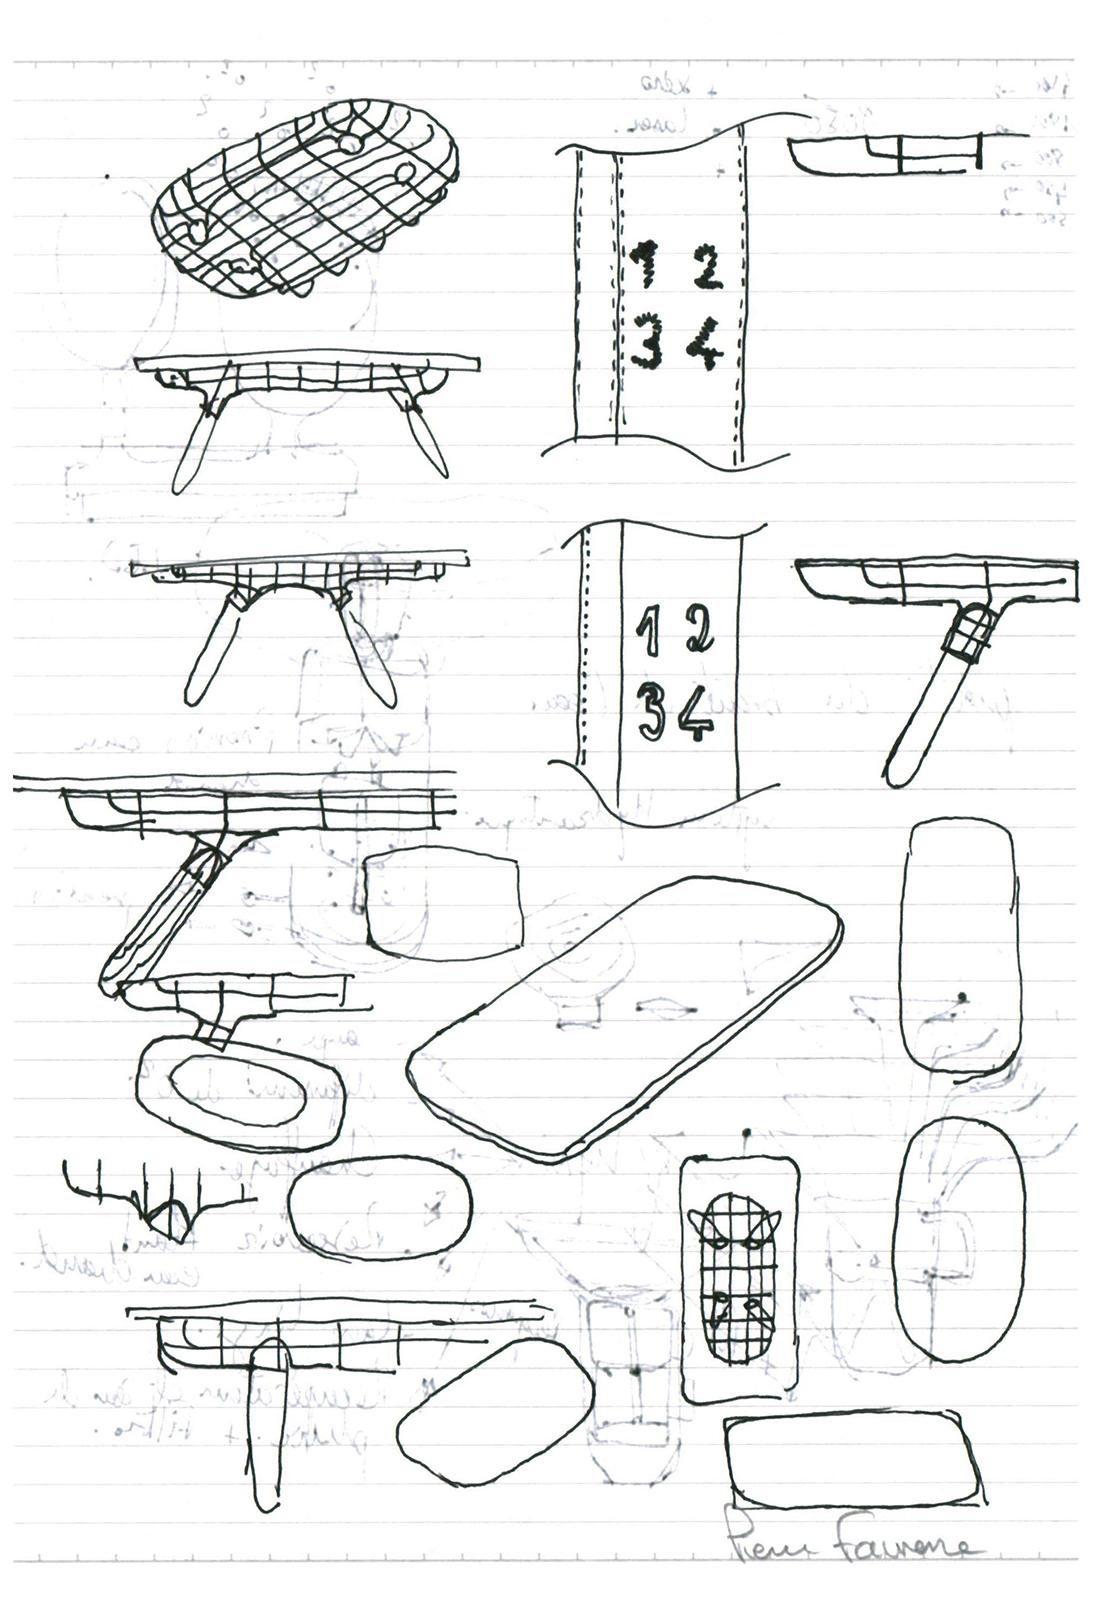 Pierre Favresse - Drawing - Work - Designer - Design - Preparatory sketch